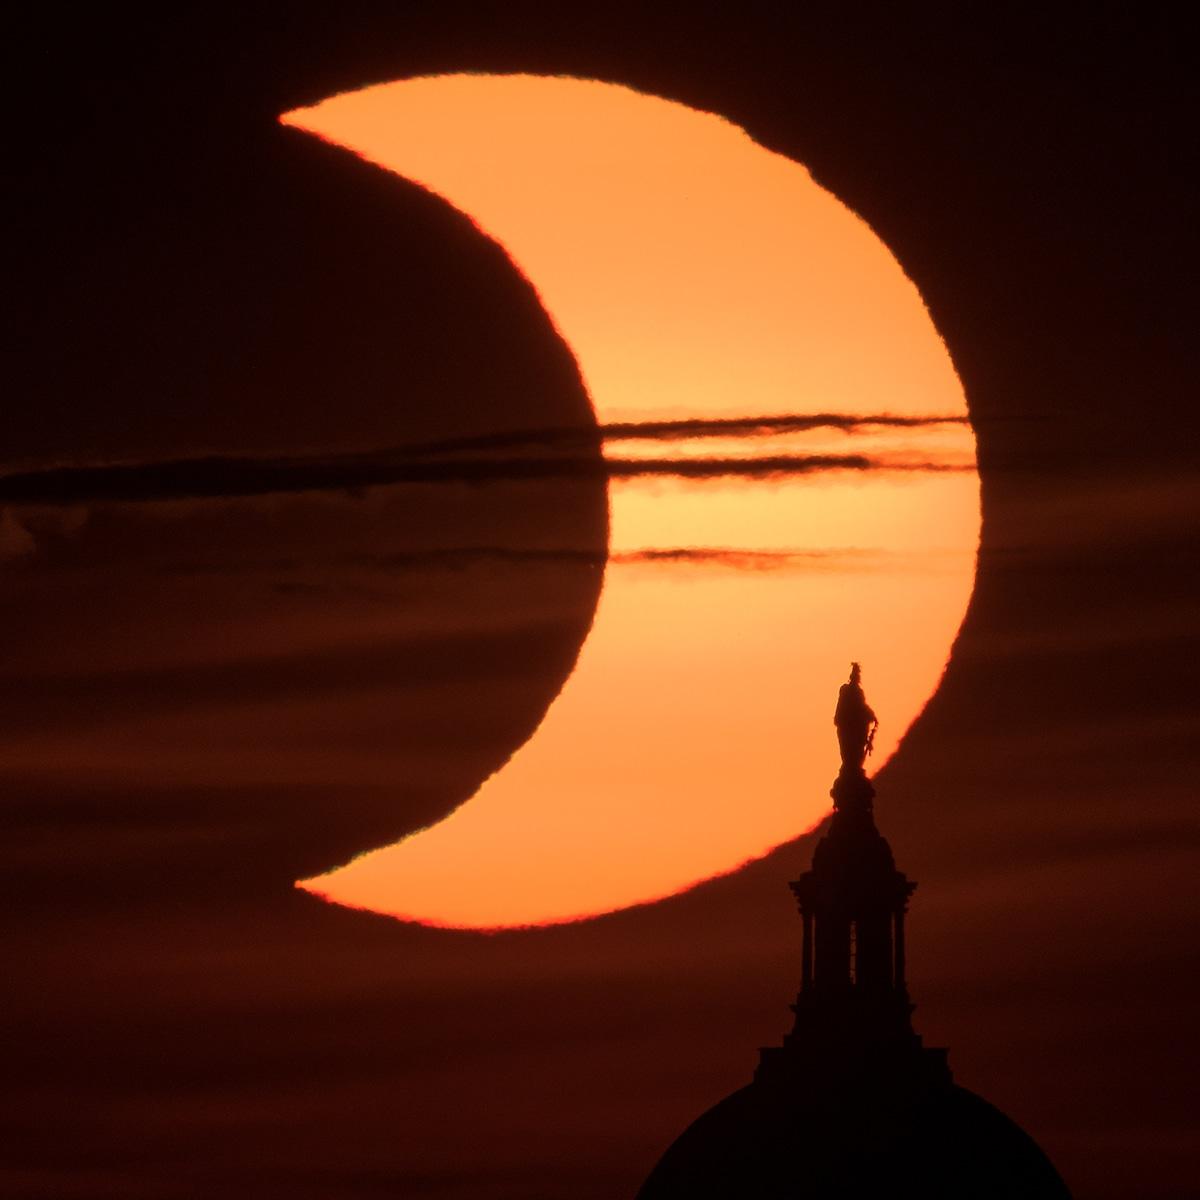 2021 Partial Solar Eclipse